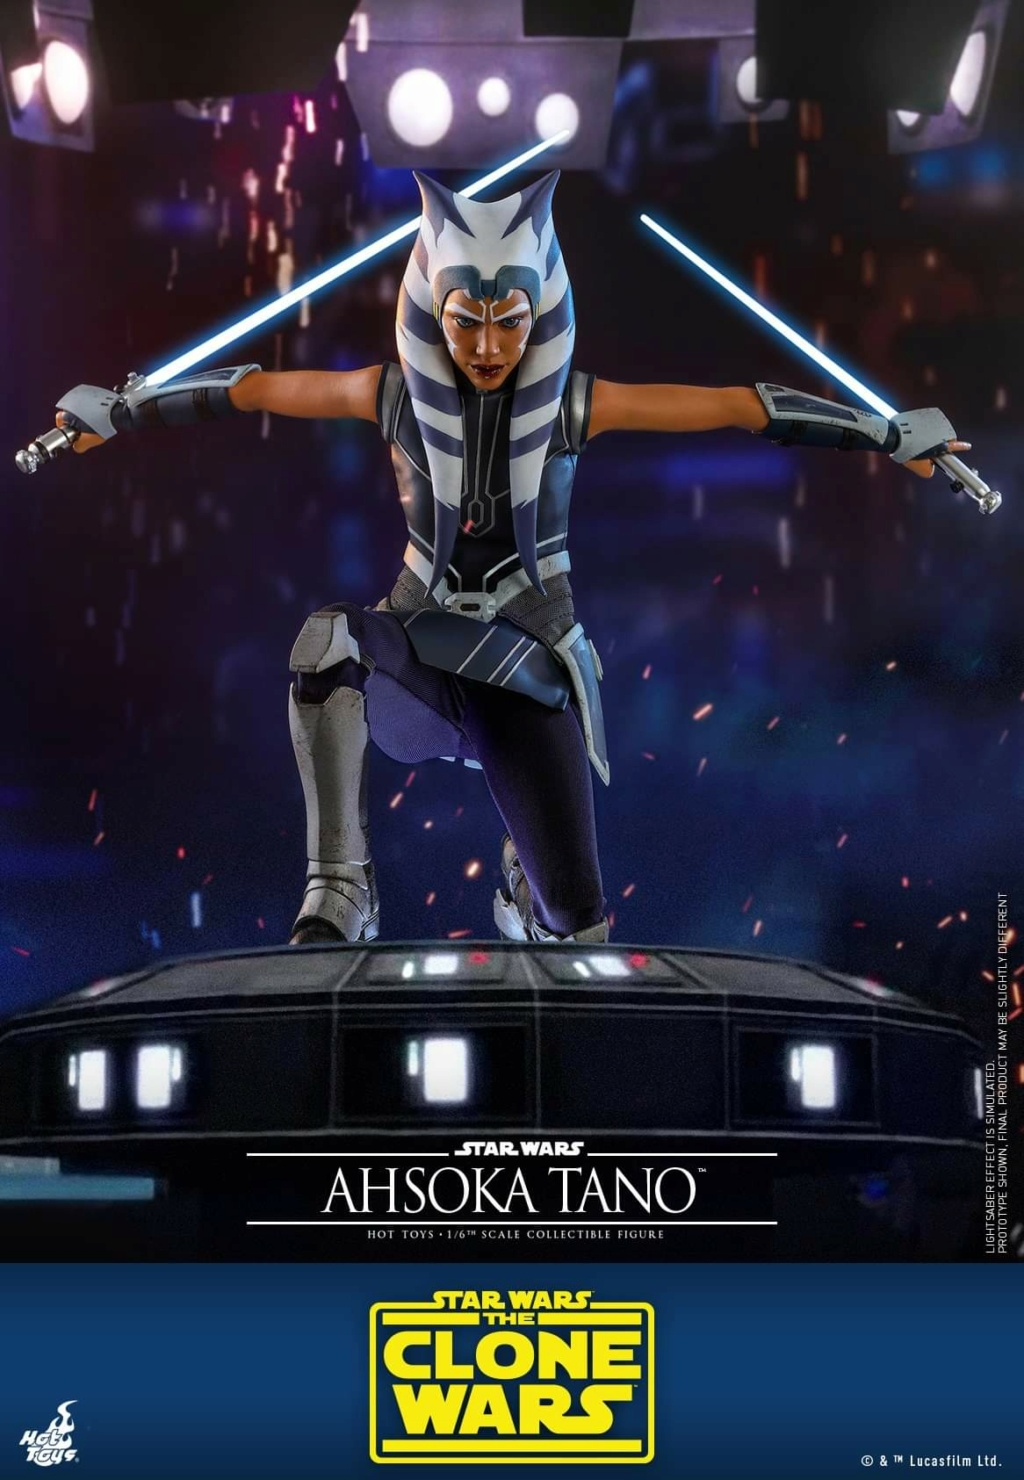 Ahsoka Tano - 1/6th scale - The Clone Wars - Hot Toys Fb_im134